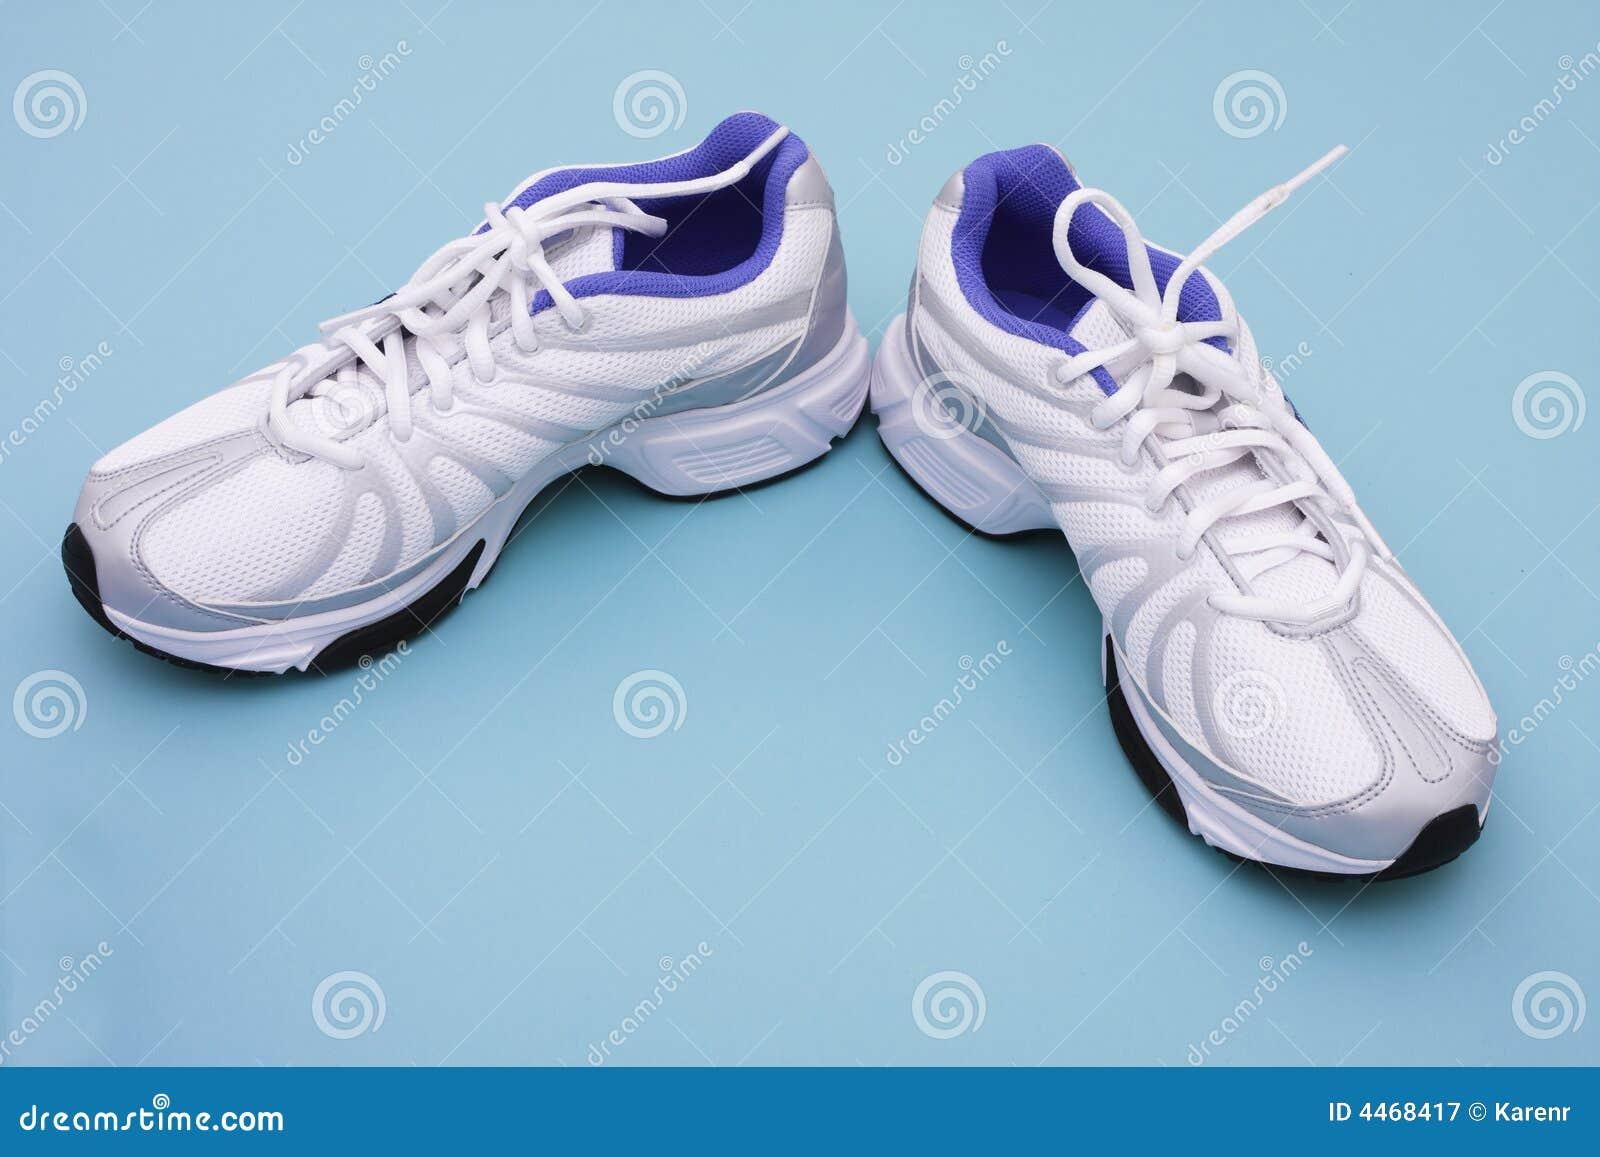 74817cc94a αθλητικά παπούτσια στοκ εικόνα. εικόνα από lifestyle